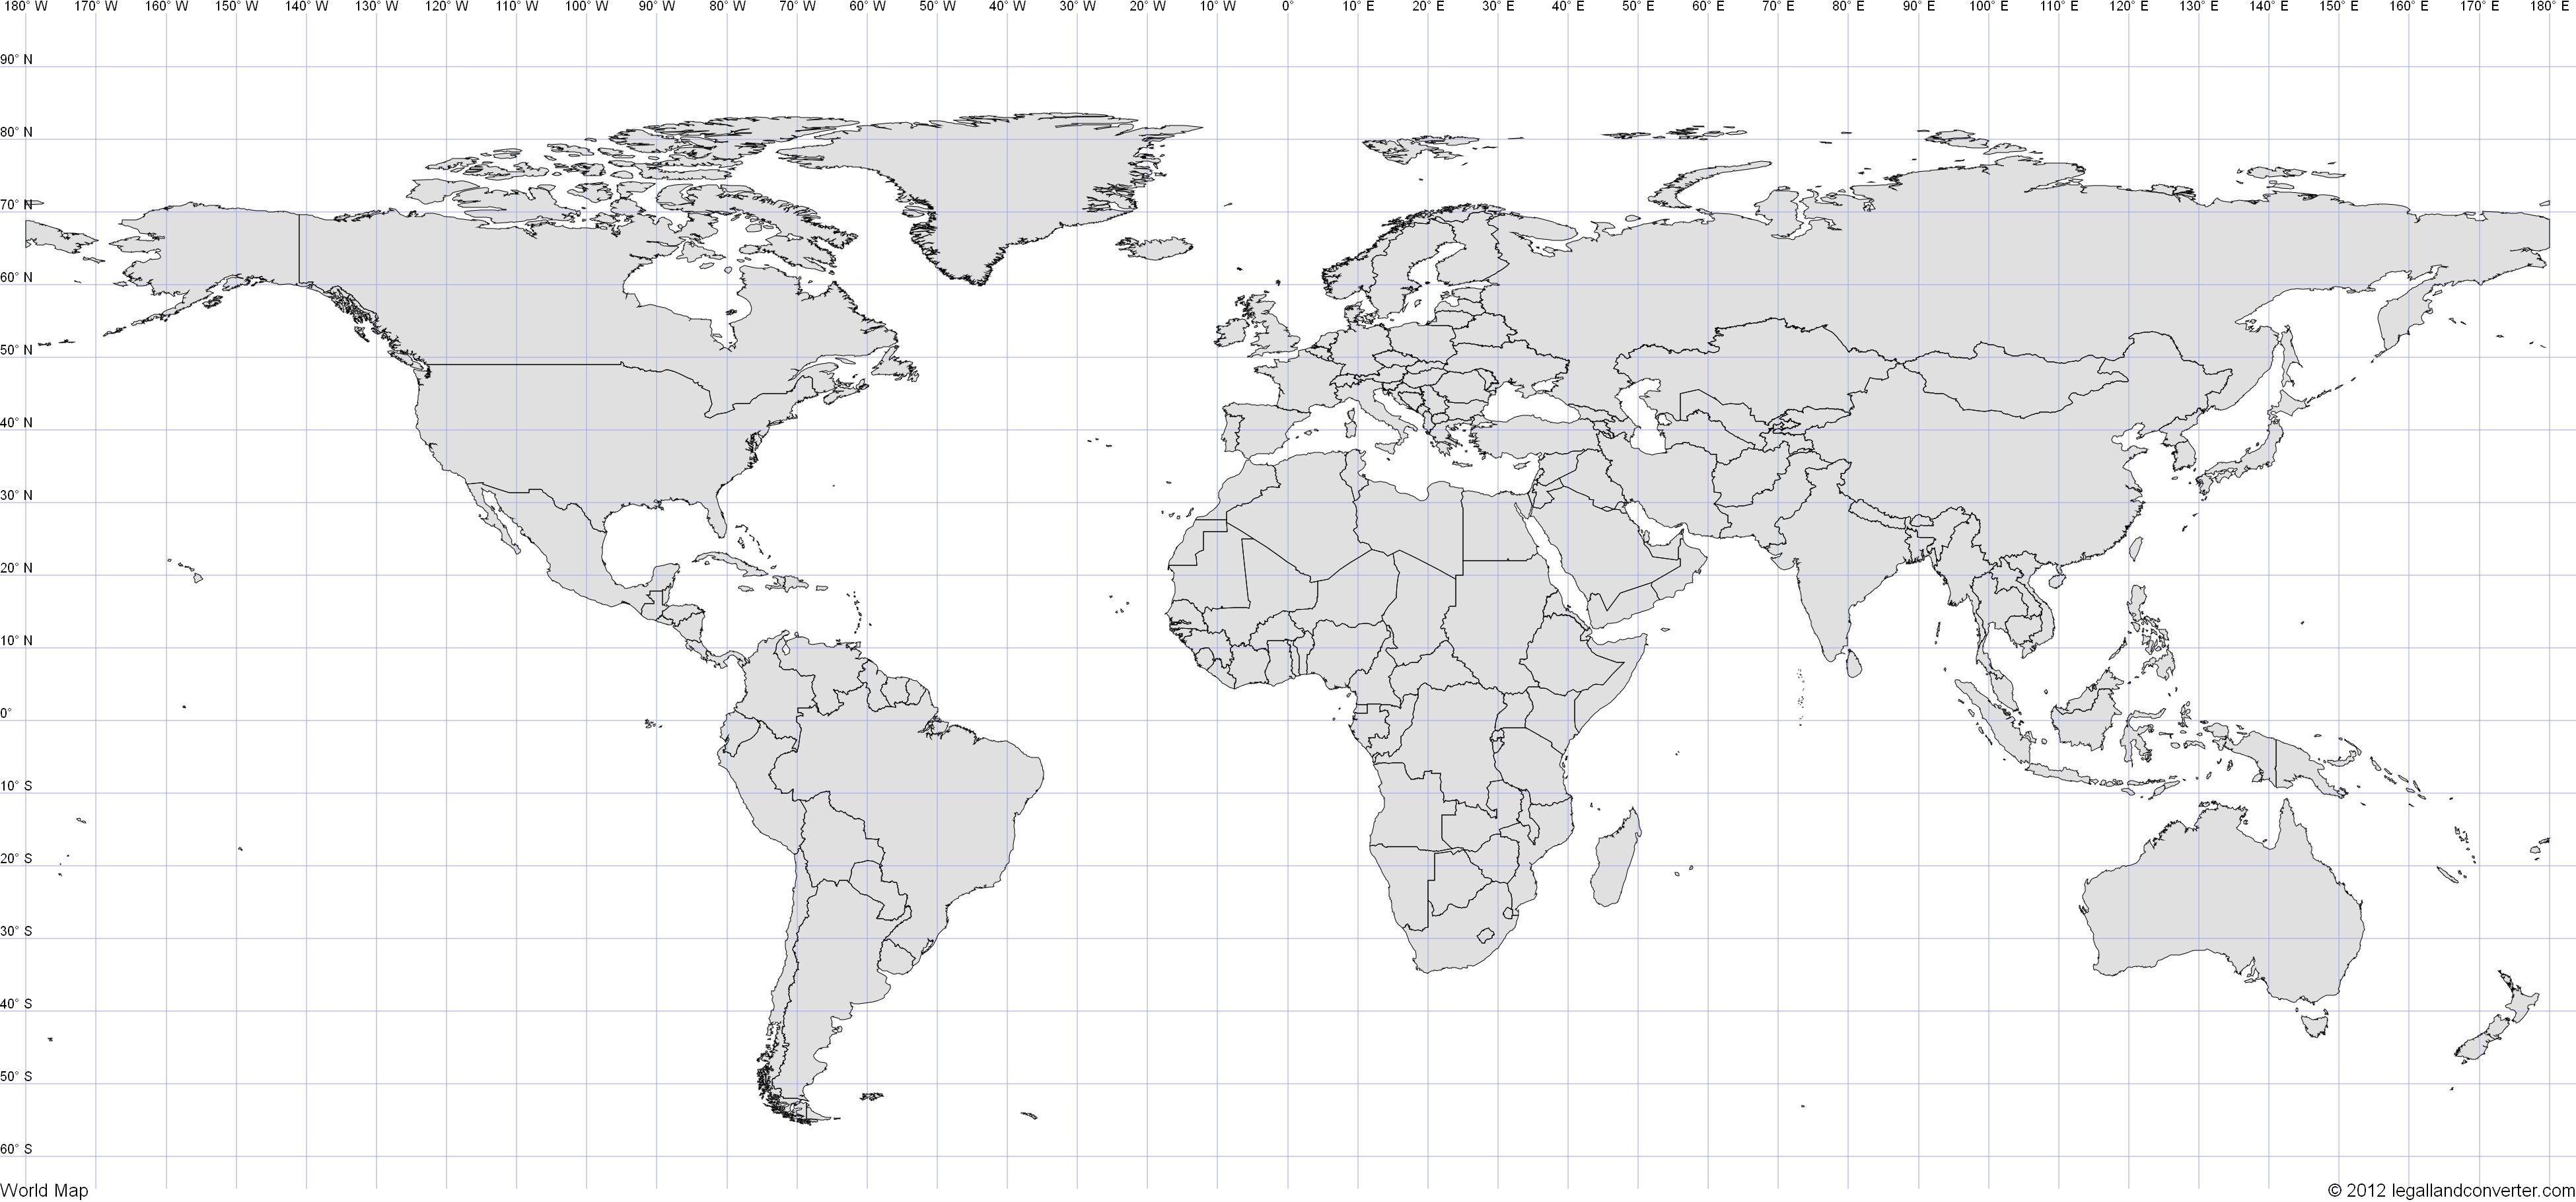 World Map With Latitude And Longitude Pdf World Map Latitude Longitude Pdf Best And The Within Of With